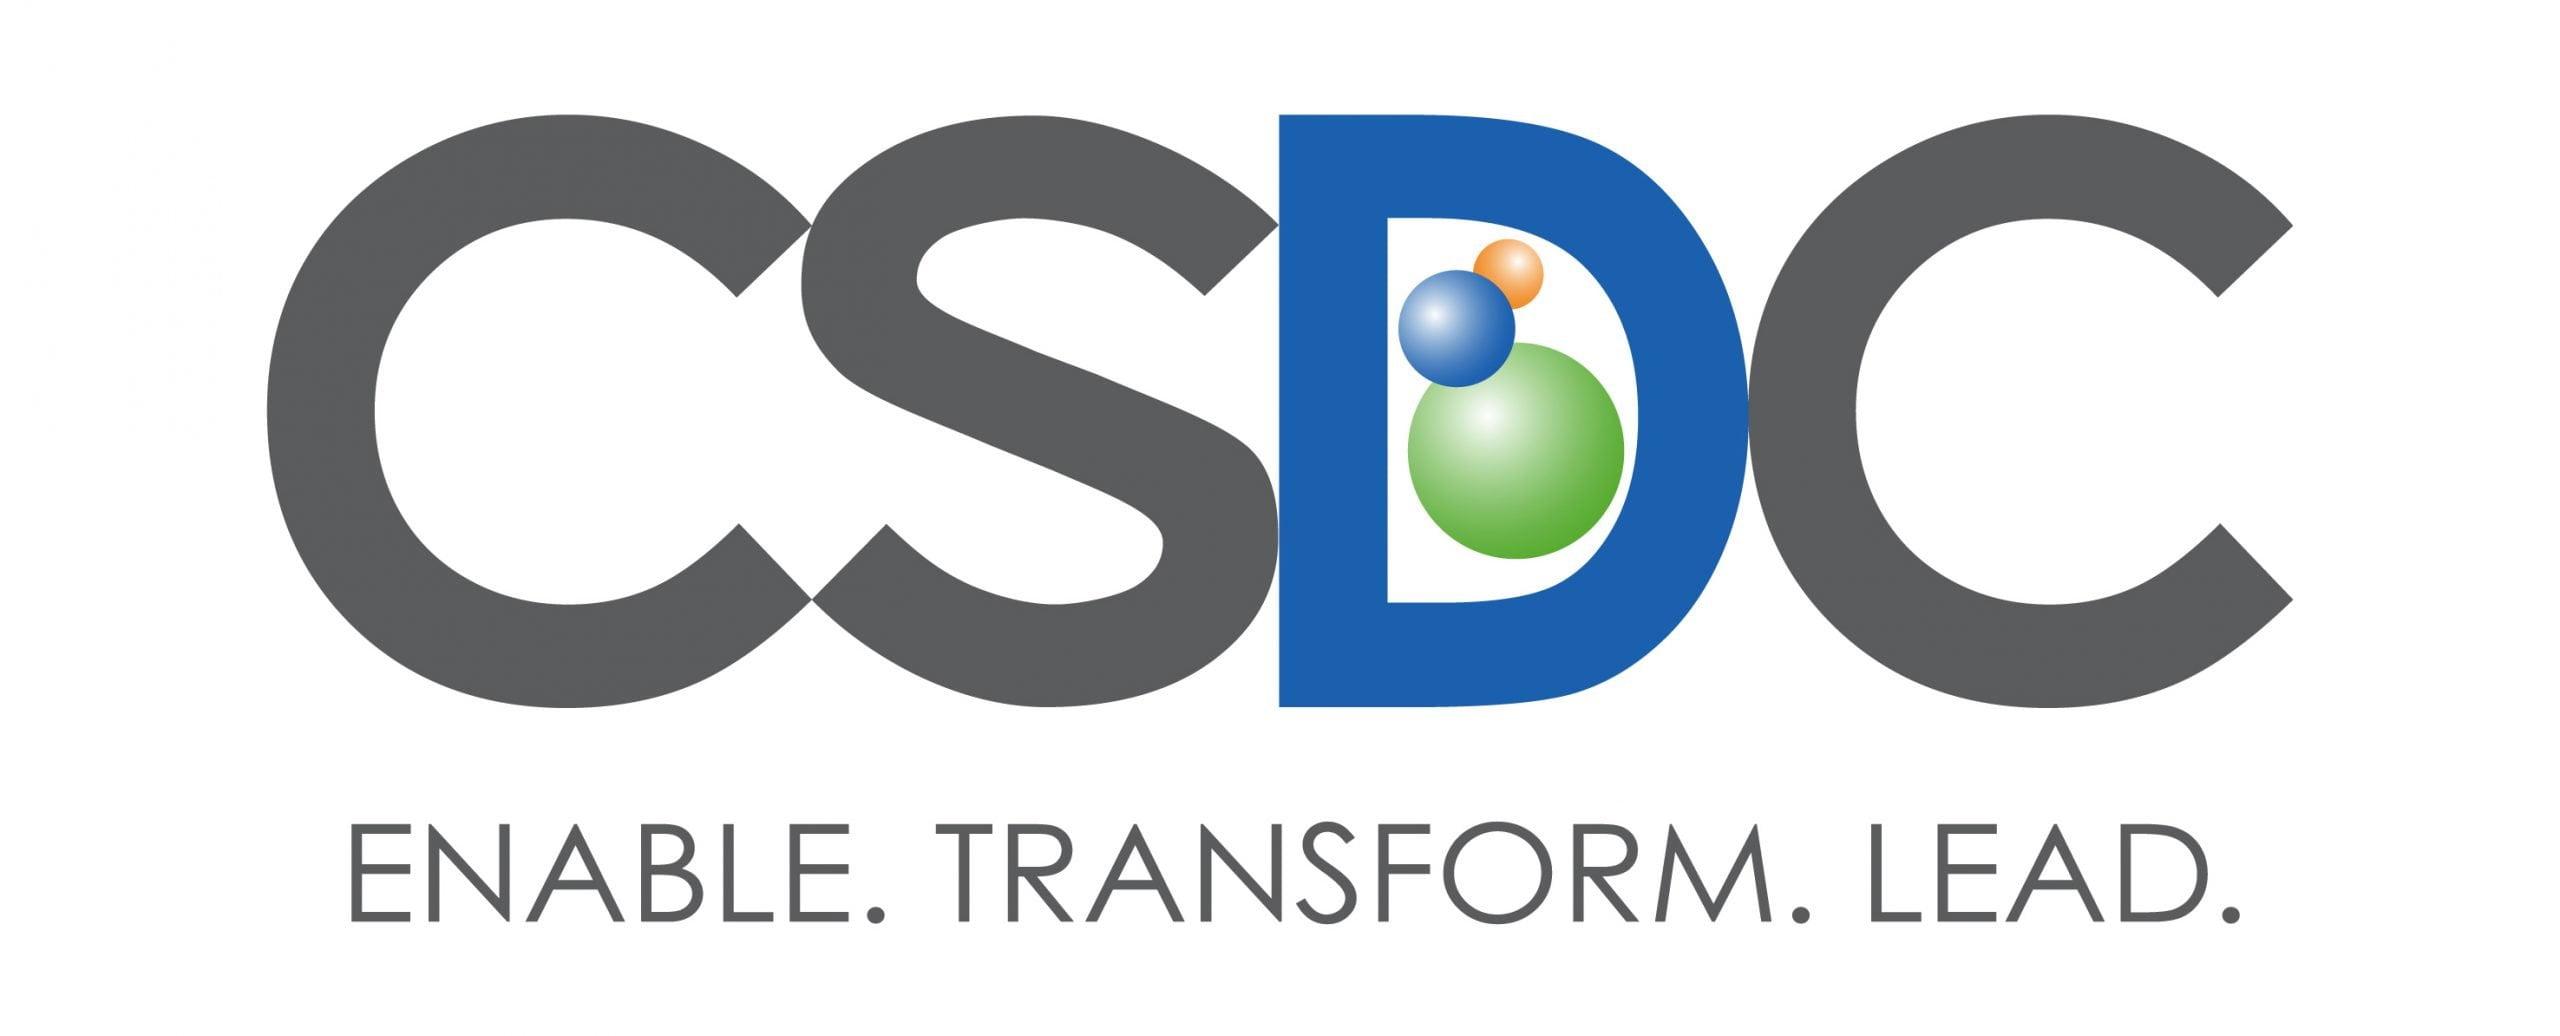 CSDC India Technologies (P) Ltd